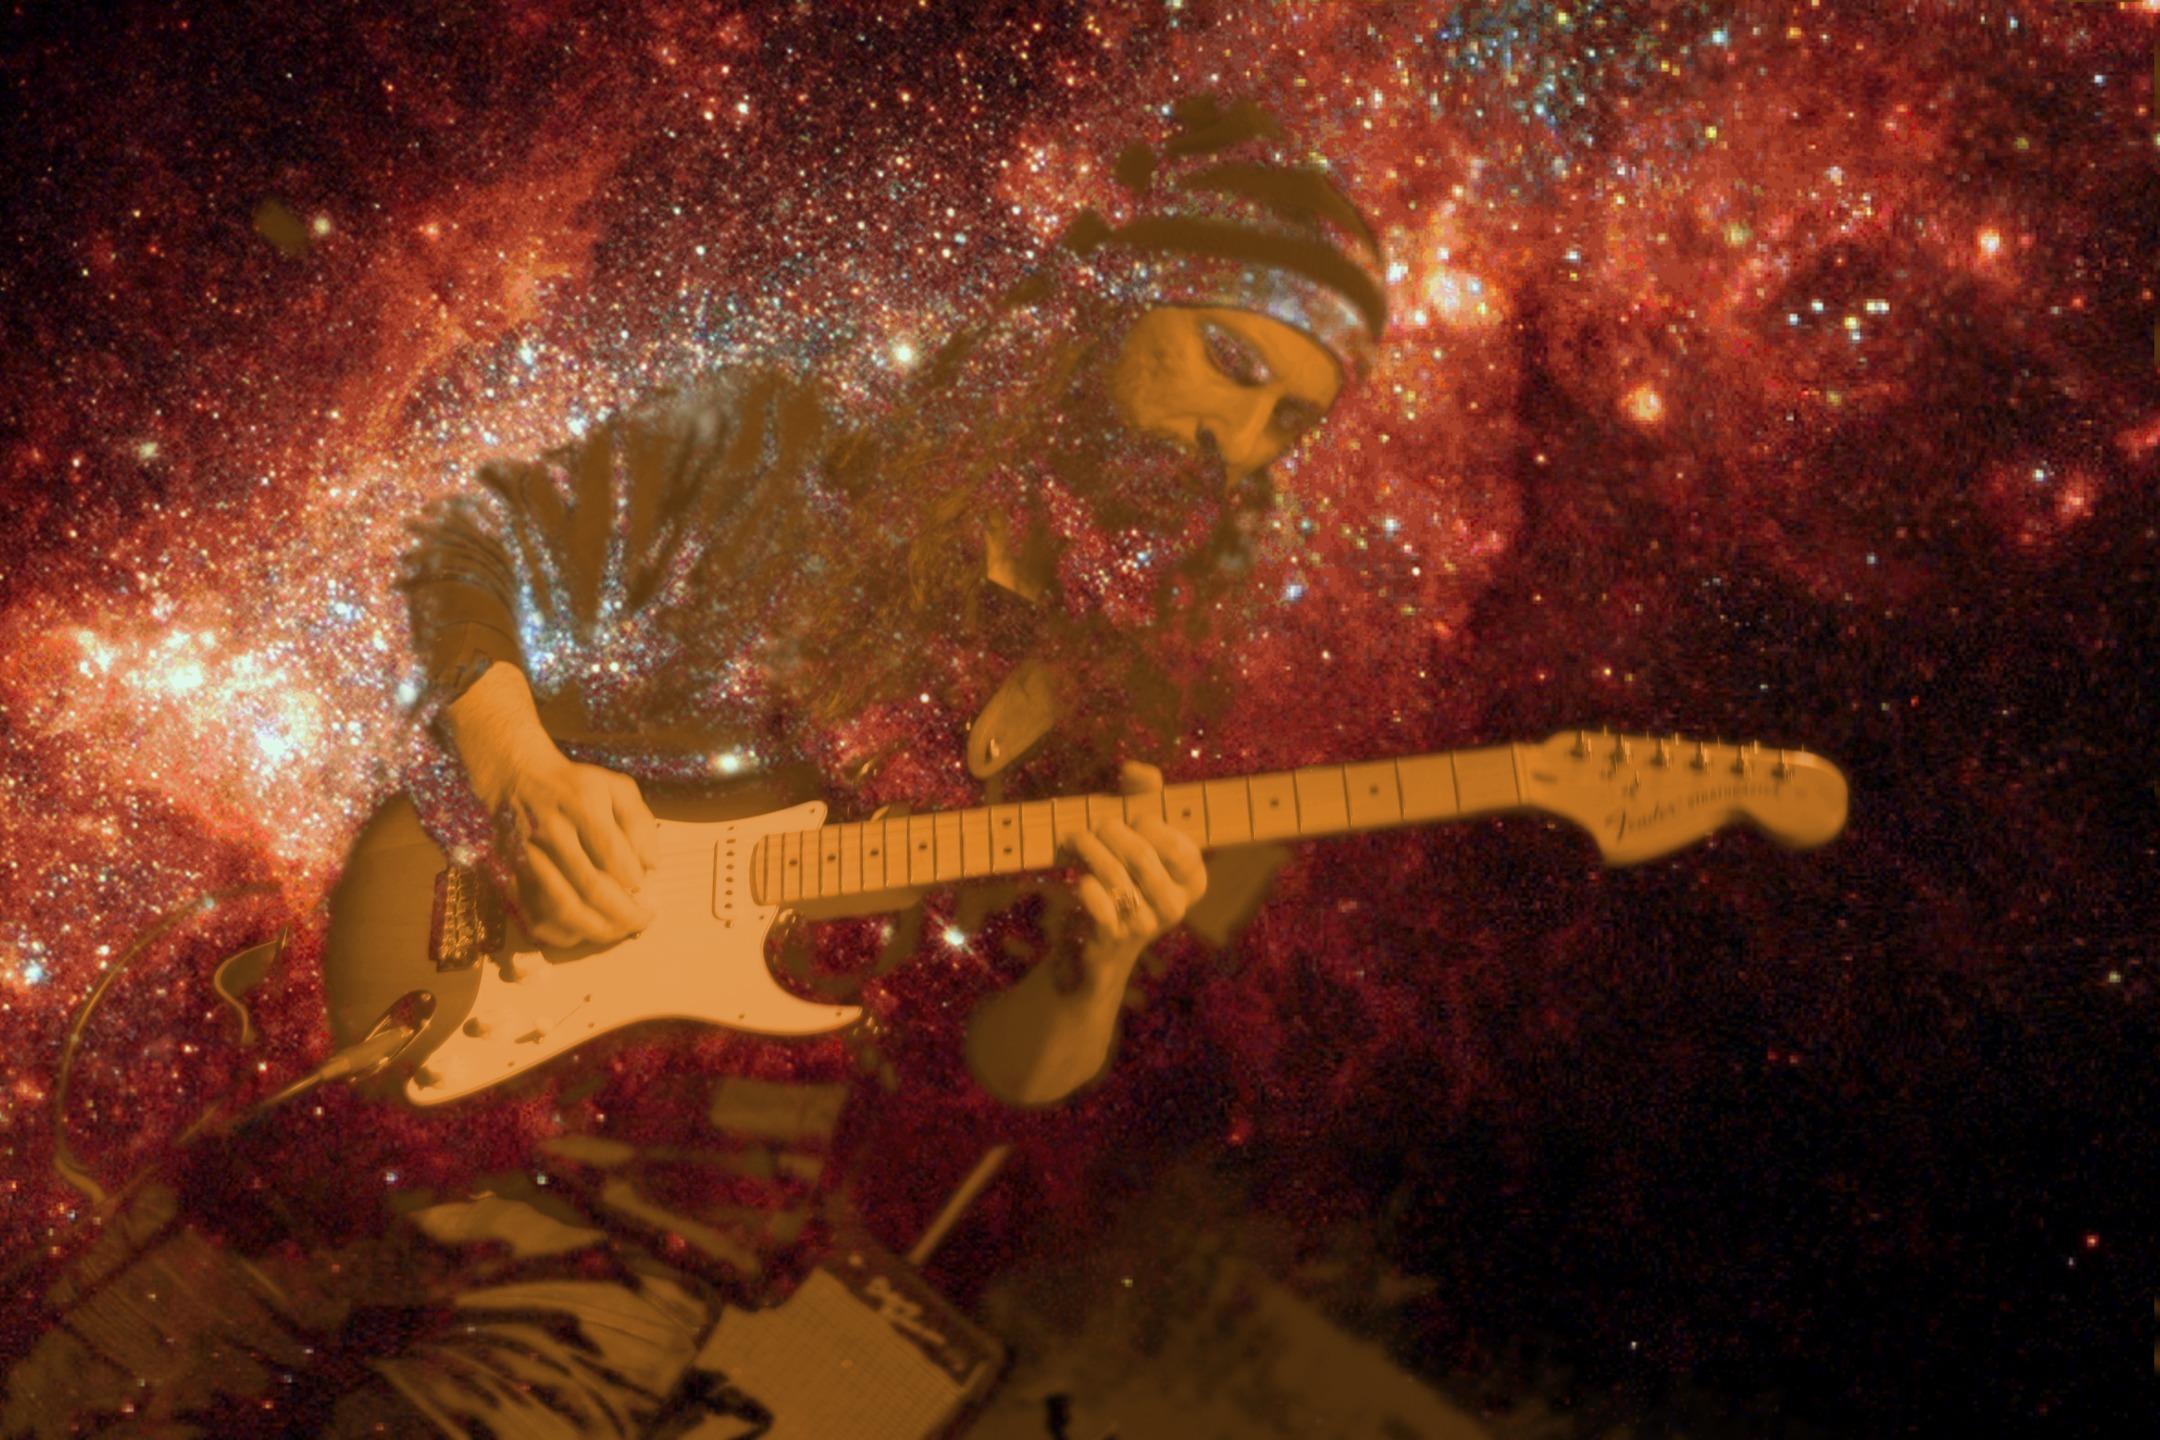 Sócrates el Guitarrista (@socratesplanet) Cover Image